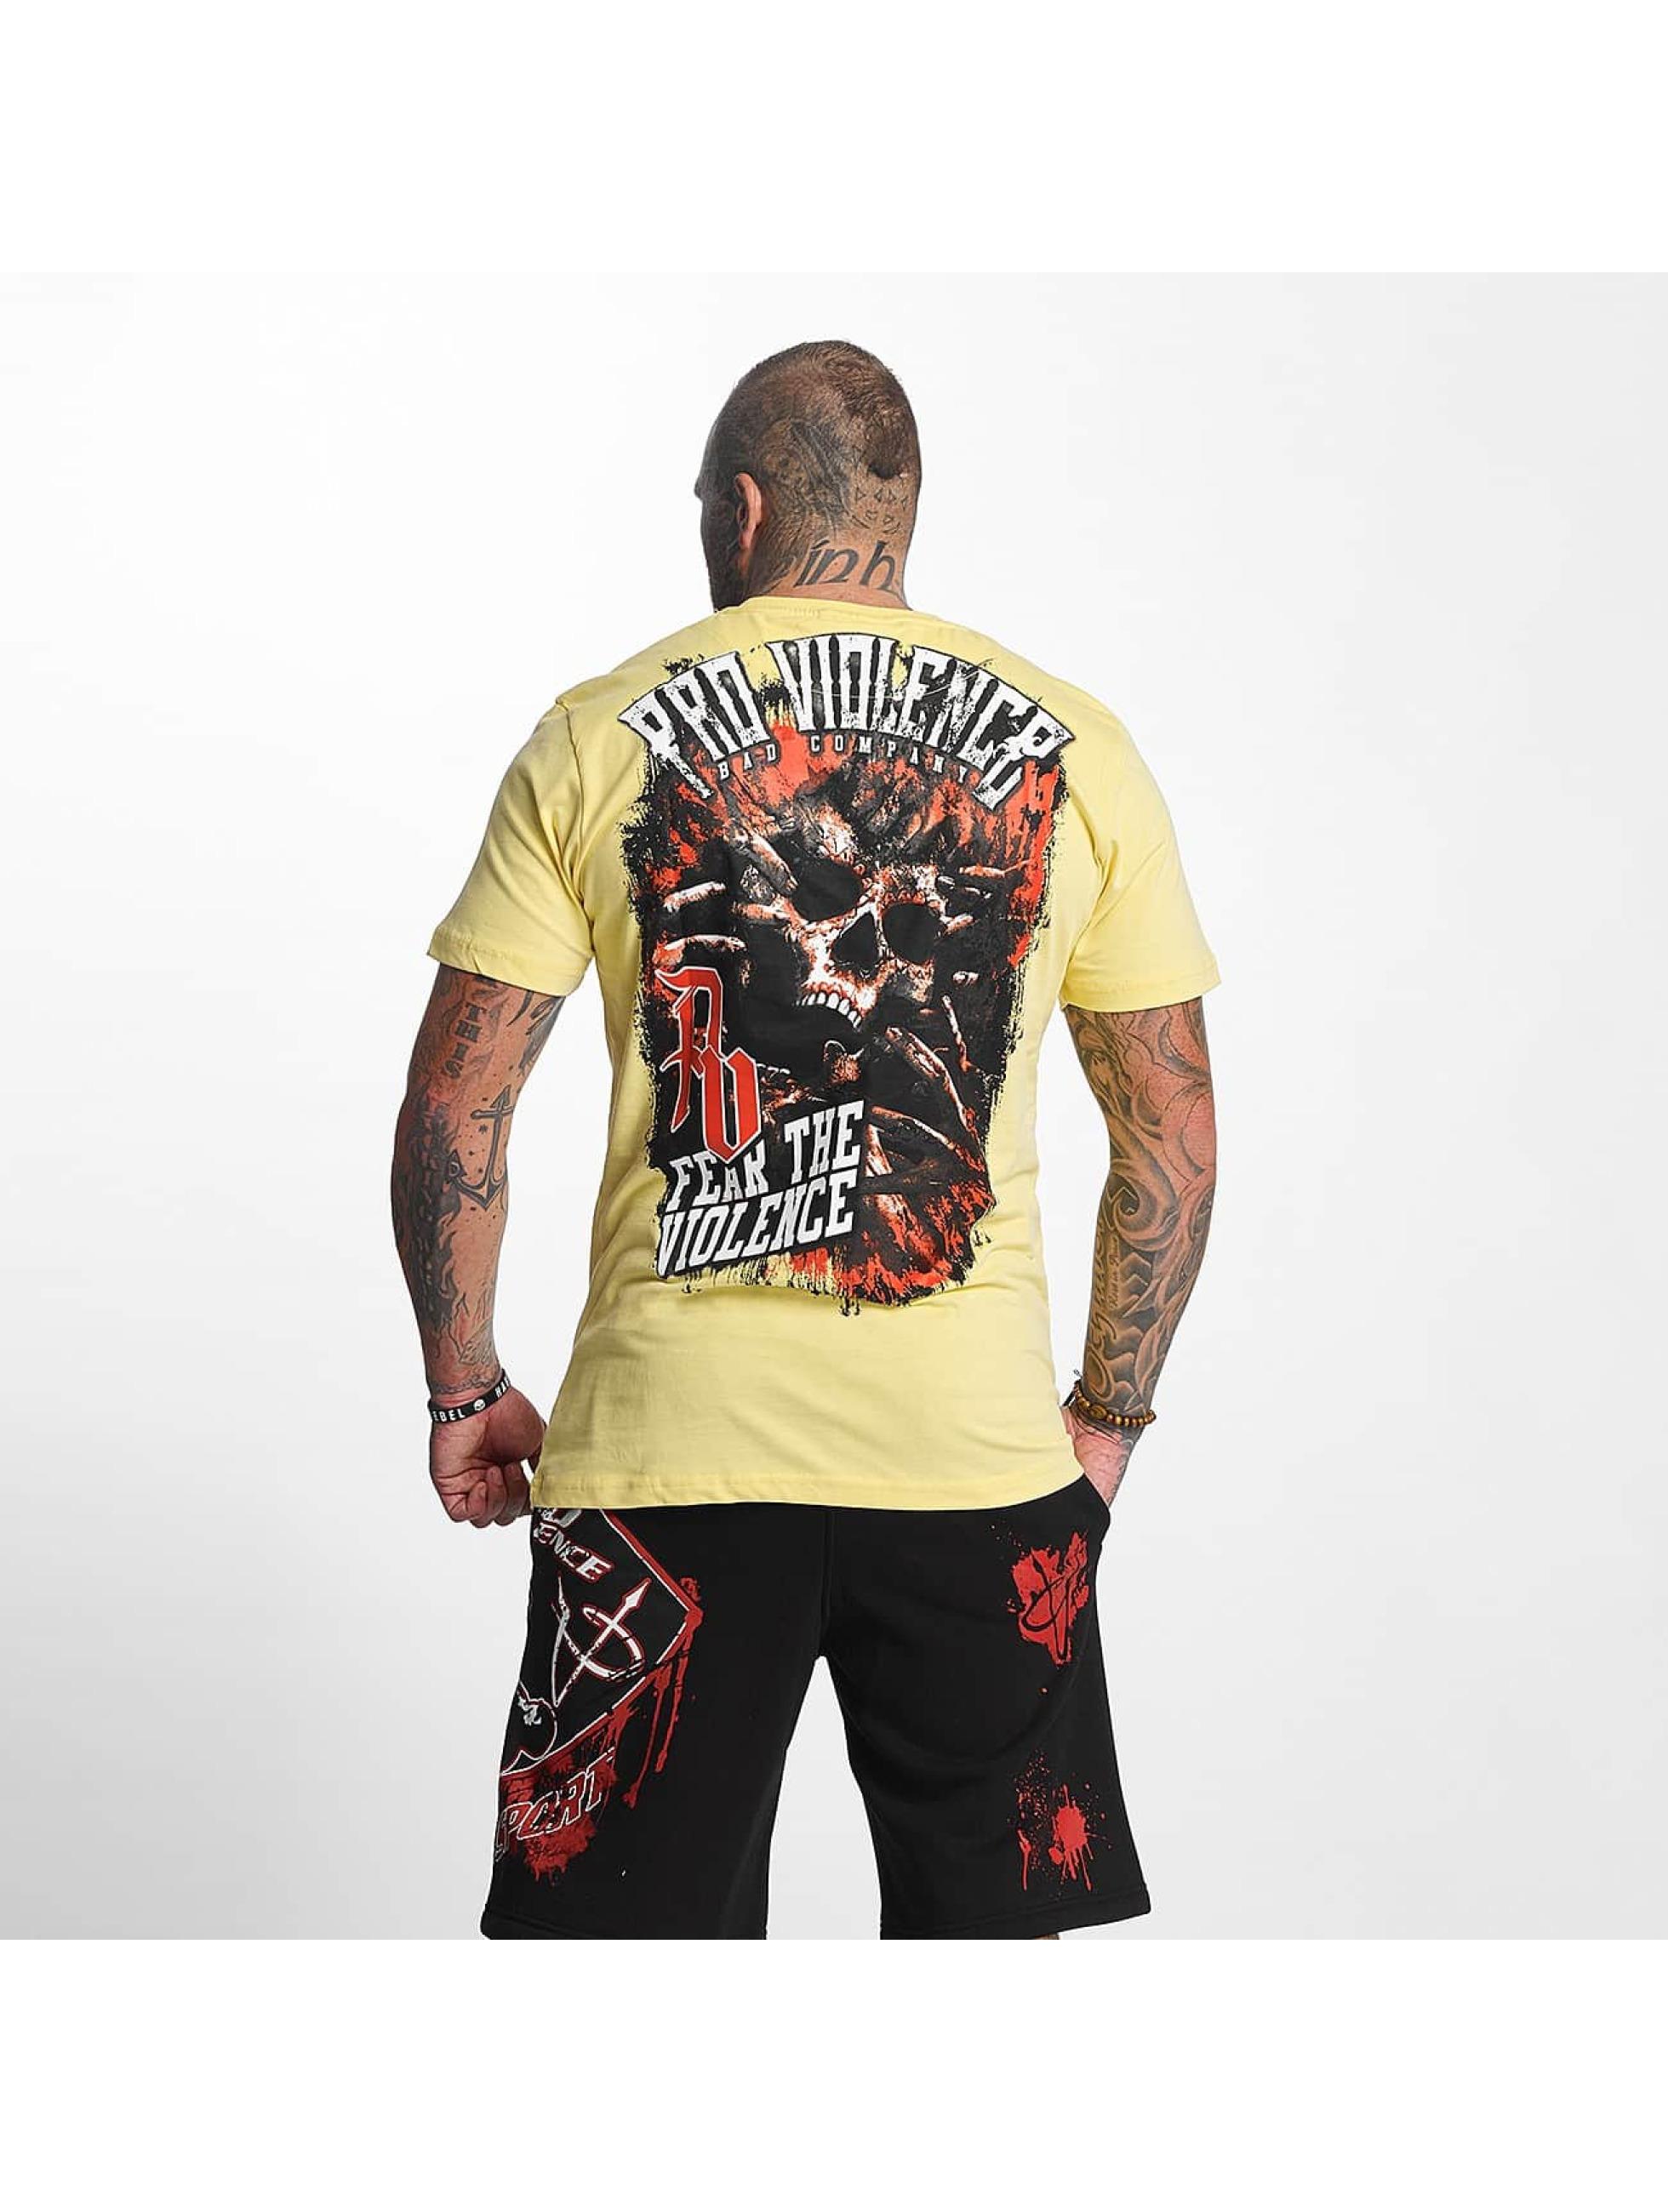 Pro Violence Streetwear t-shirt The Violence Fear geel